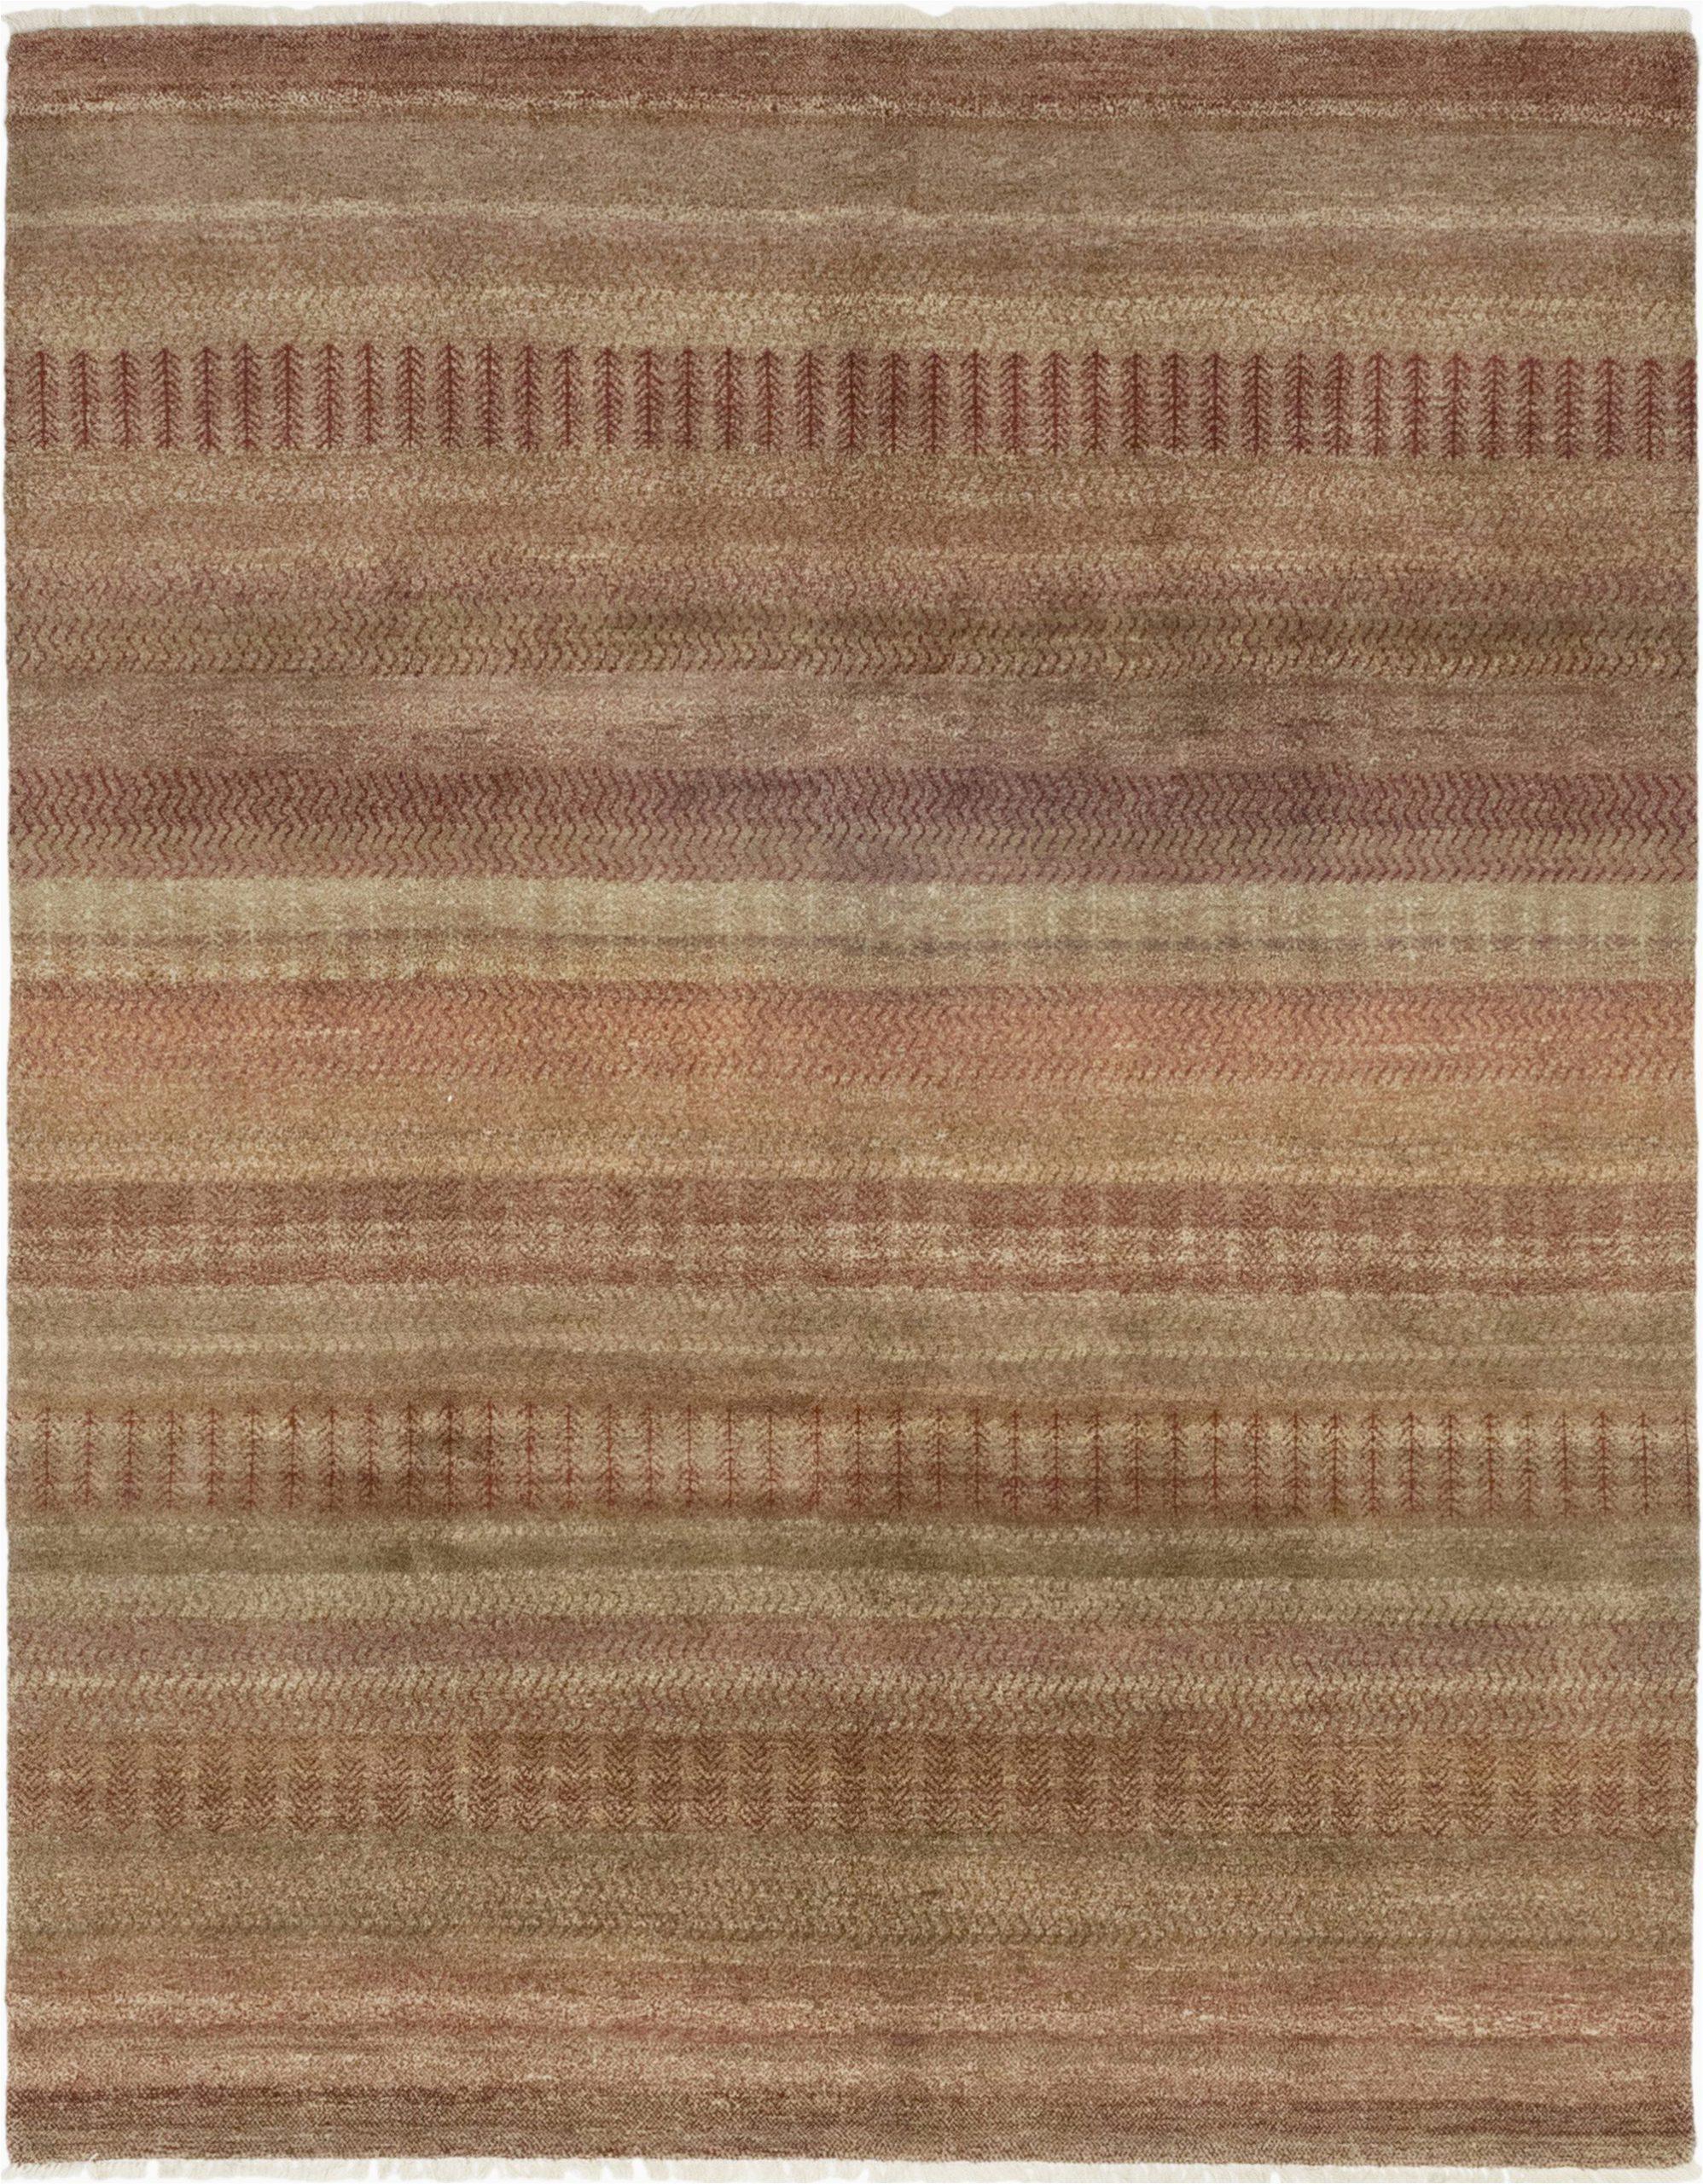 "Earth tone Color area Rugs Savannah Hand Knotted area Rug 8 0"" X 10 4"""